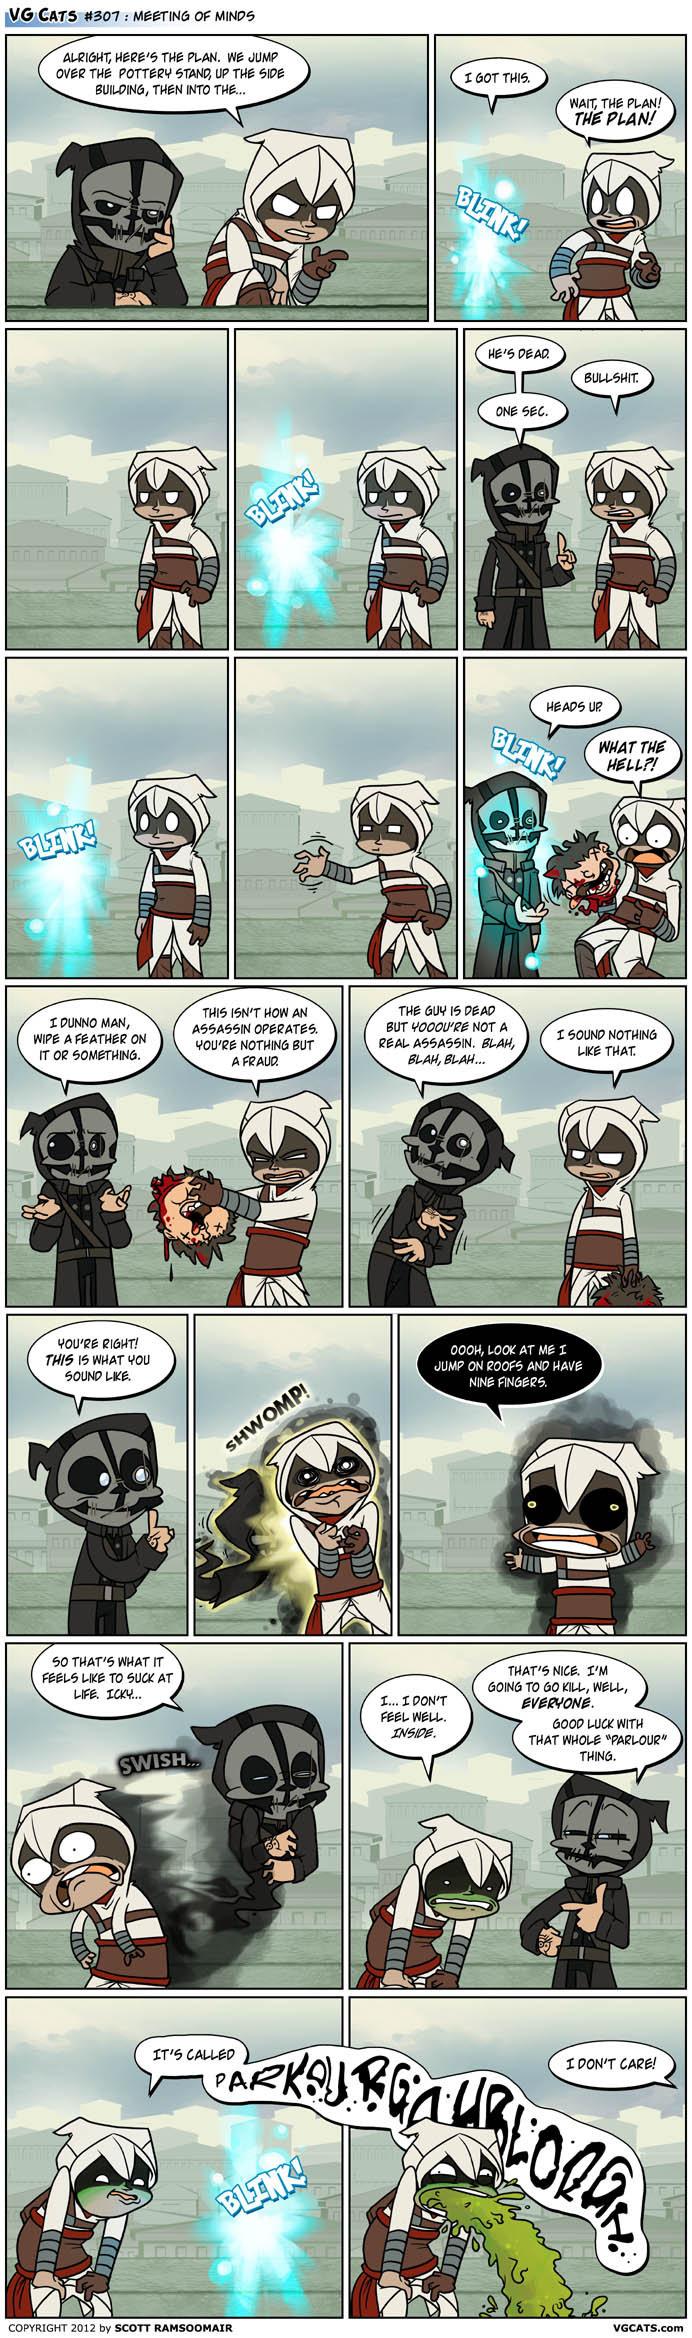 Dishonored Assassin. Source: VG Cats - www.vgcats.com/.. assassins are still badass.. badassassins vg cats dishonored assassins creed